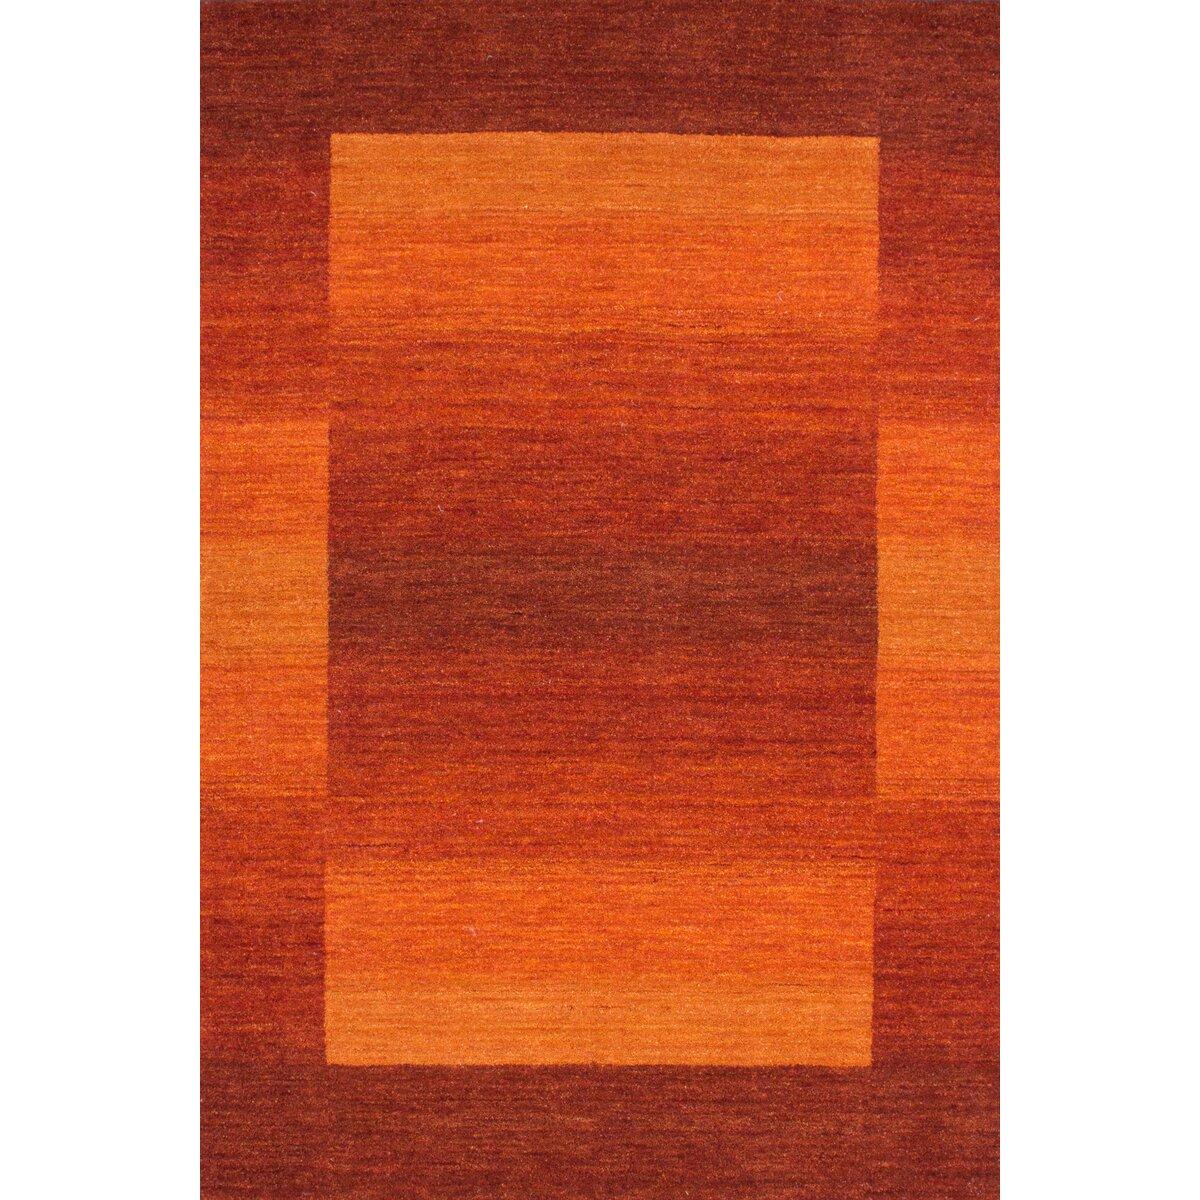 lalee handgefertigter teppich new zealand wellington in orange reviews. Black Bedroom Furniture Sets. Home Design Ideas